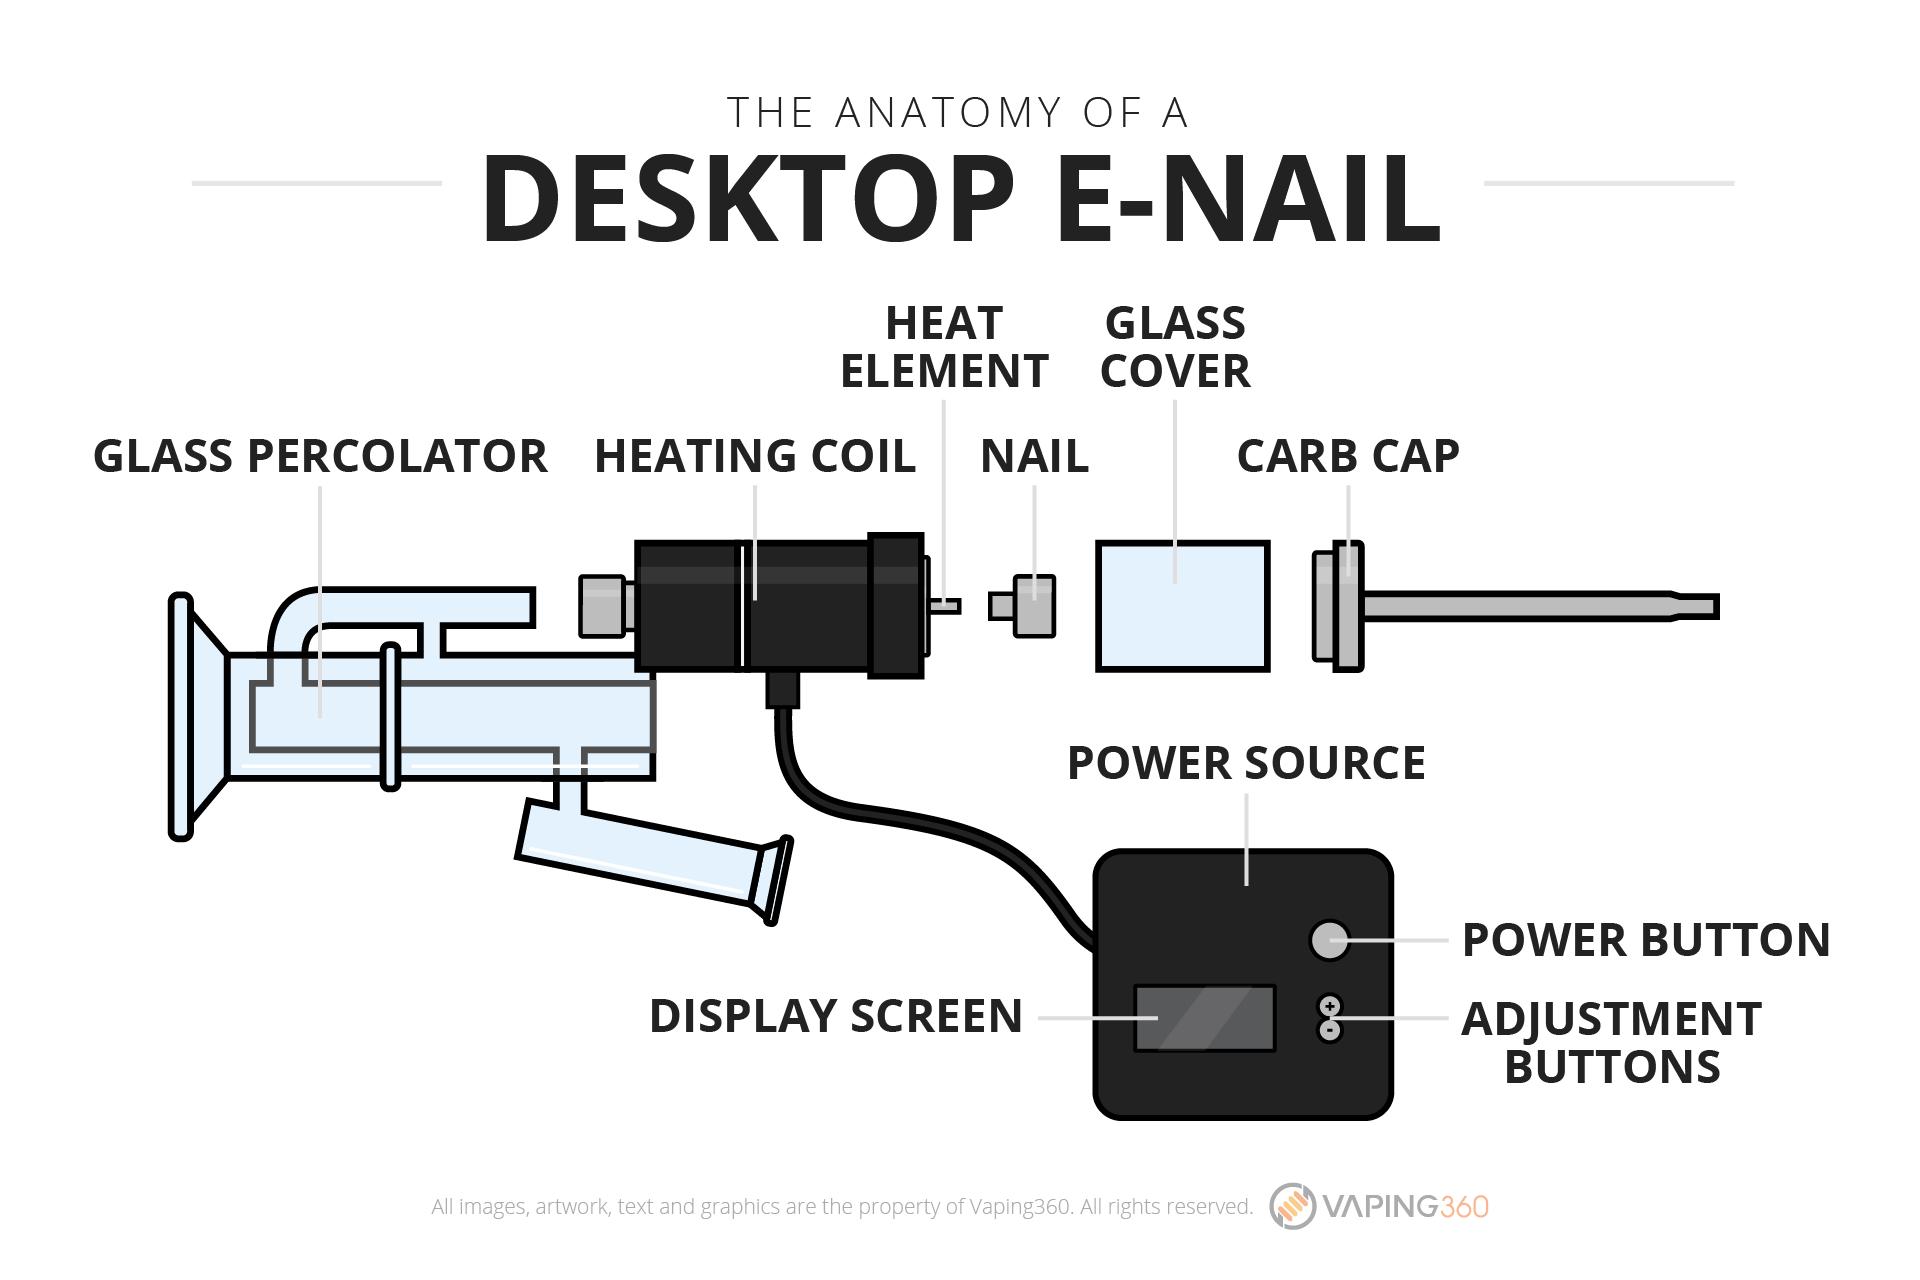 the-anatomy-of-a-desktop-e-nail